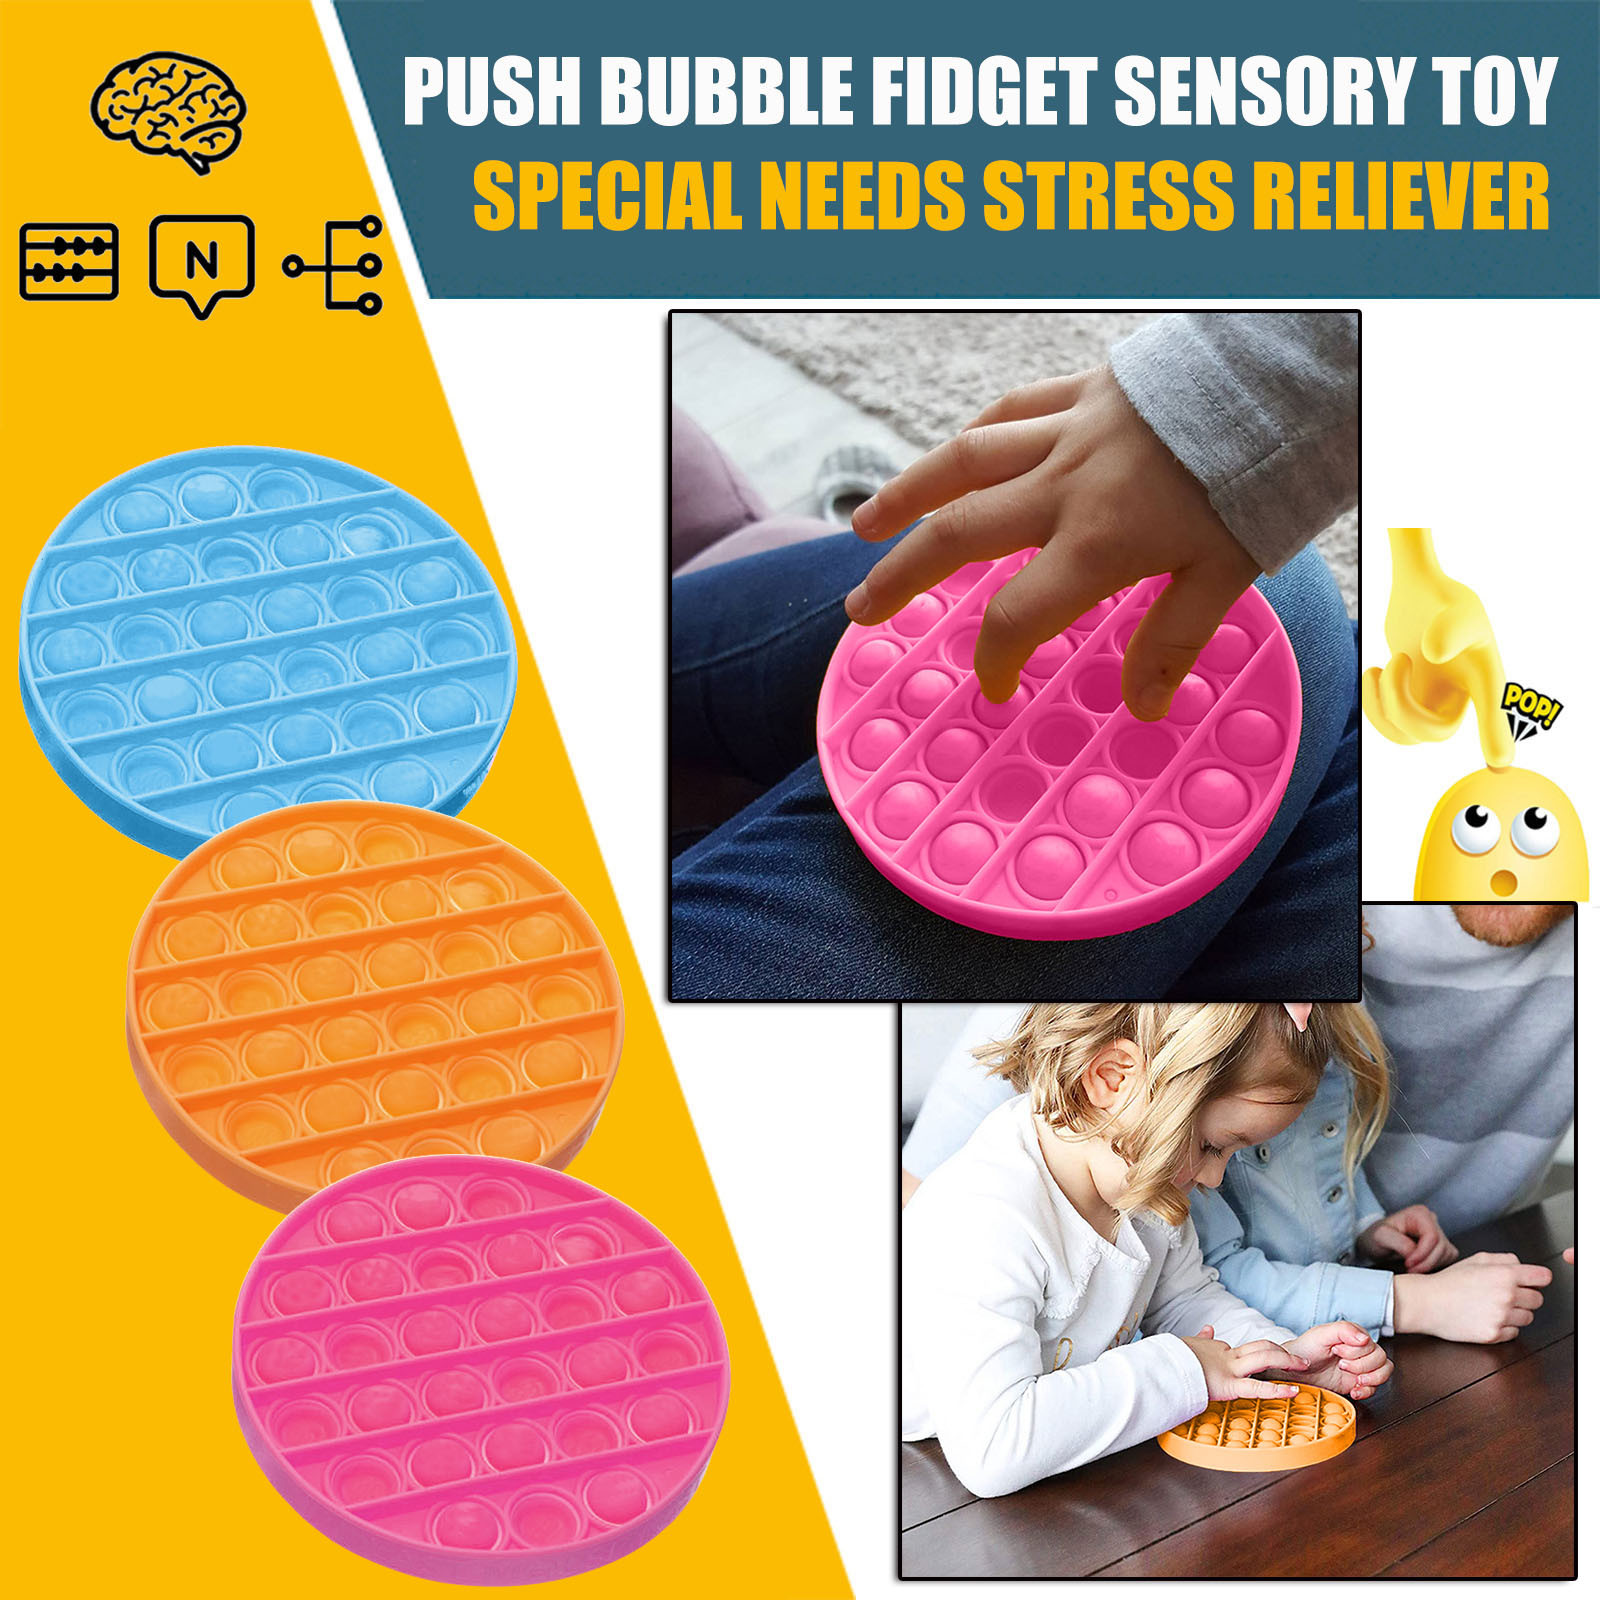 Unisex Push Bubble Fidget Sensory Toy Autism Special Needs Stress Reliever Toy Christmas Gift Wholesale Decompressie speelgoed